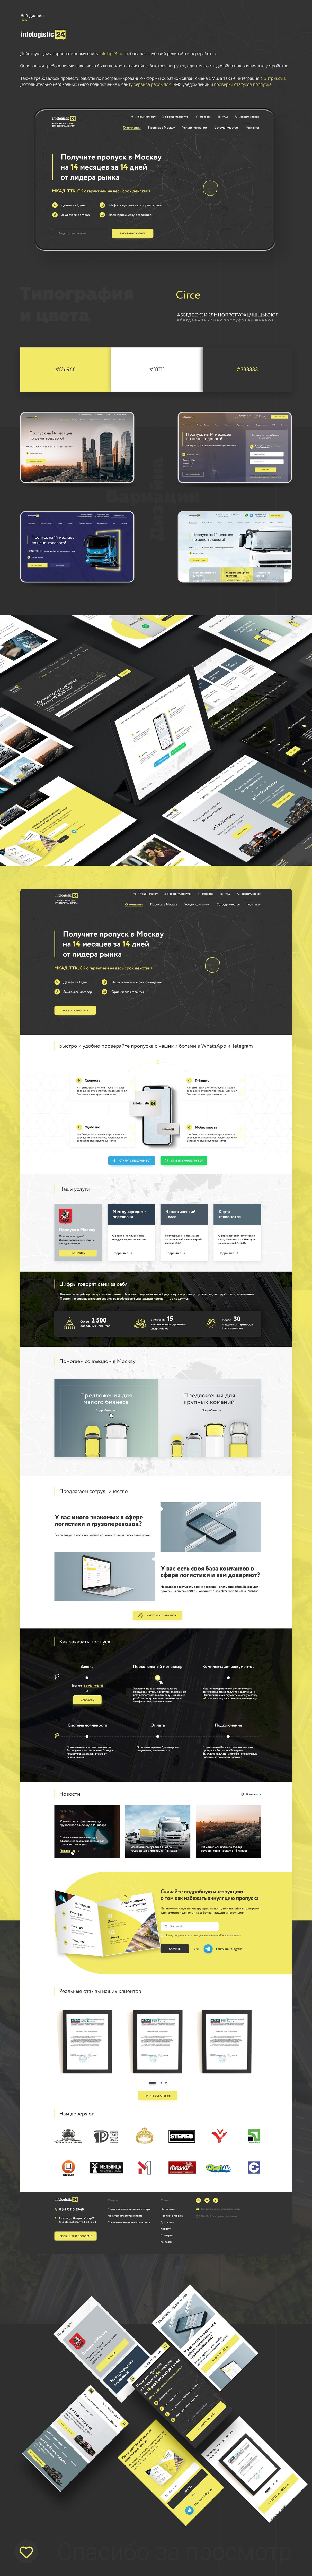 "Infolog24 - корпоративный сайт ""под ключ"""